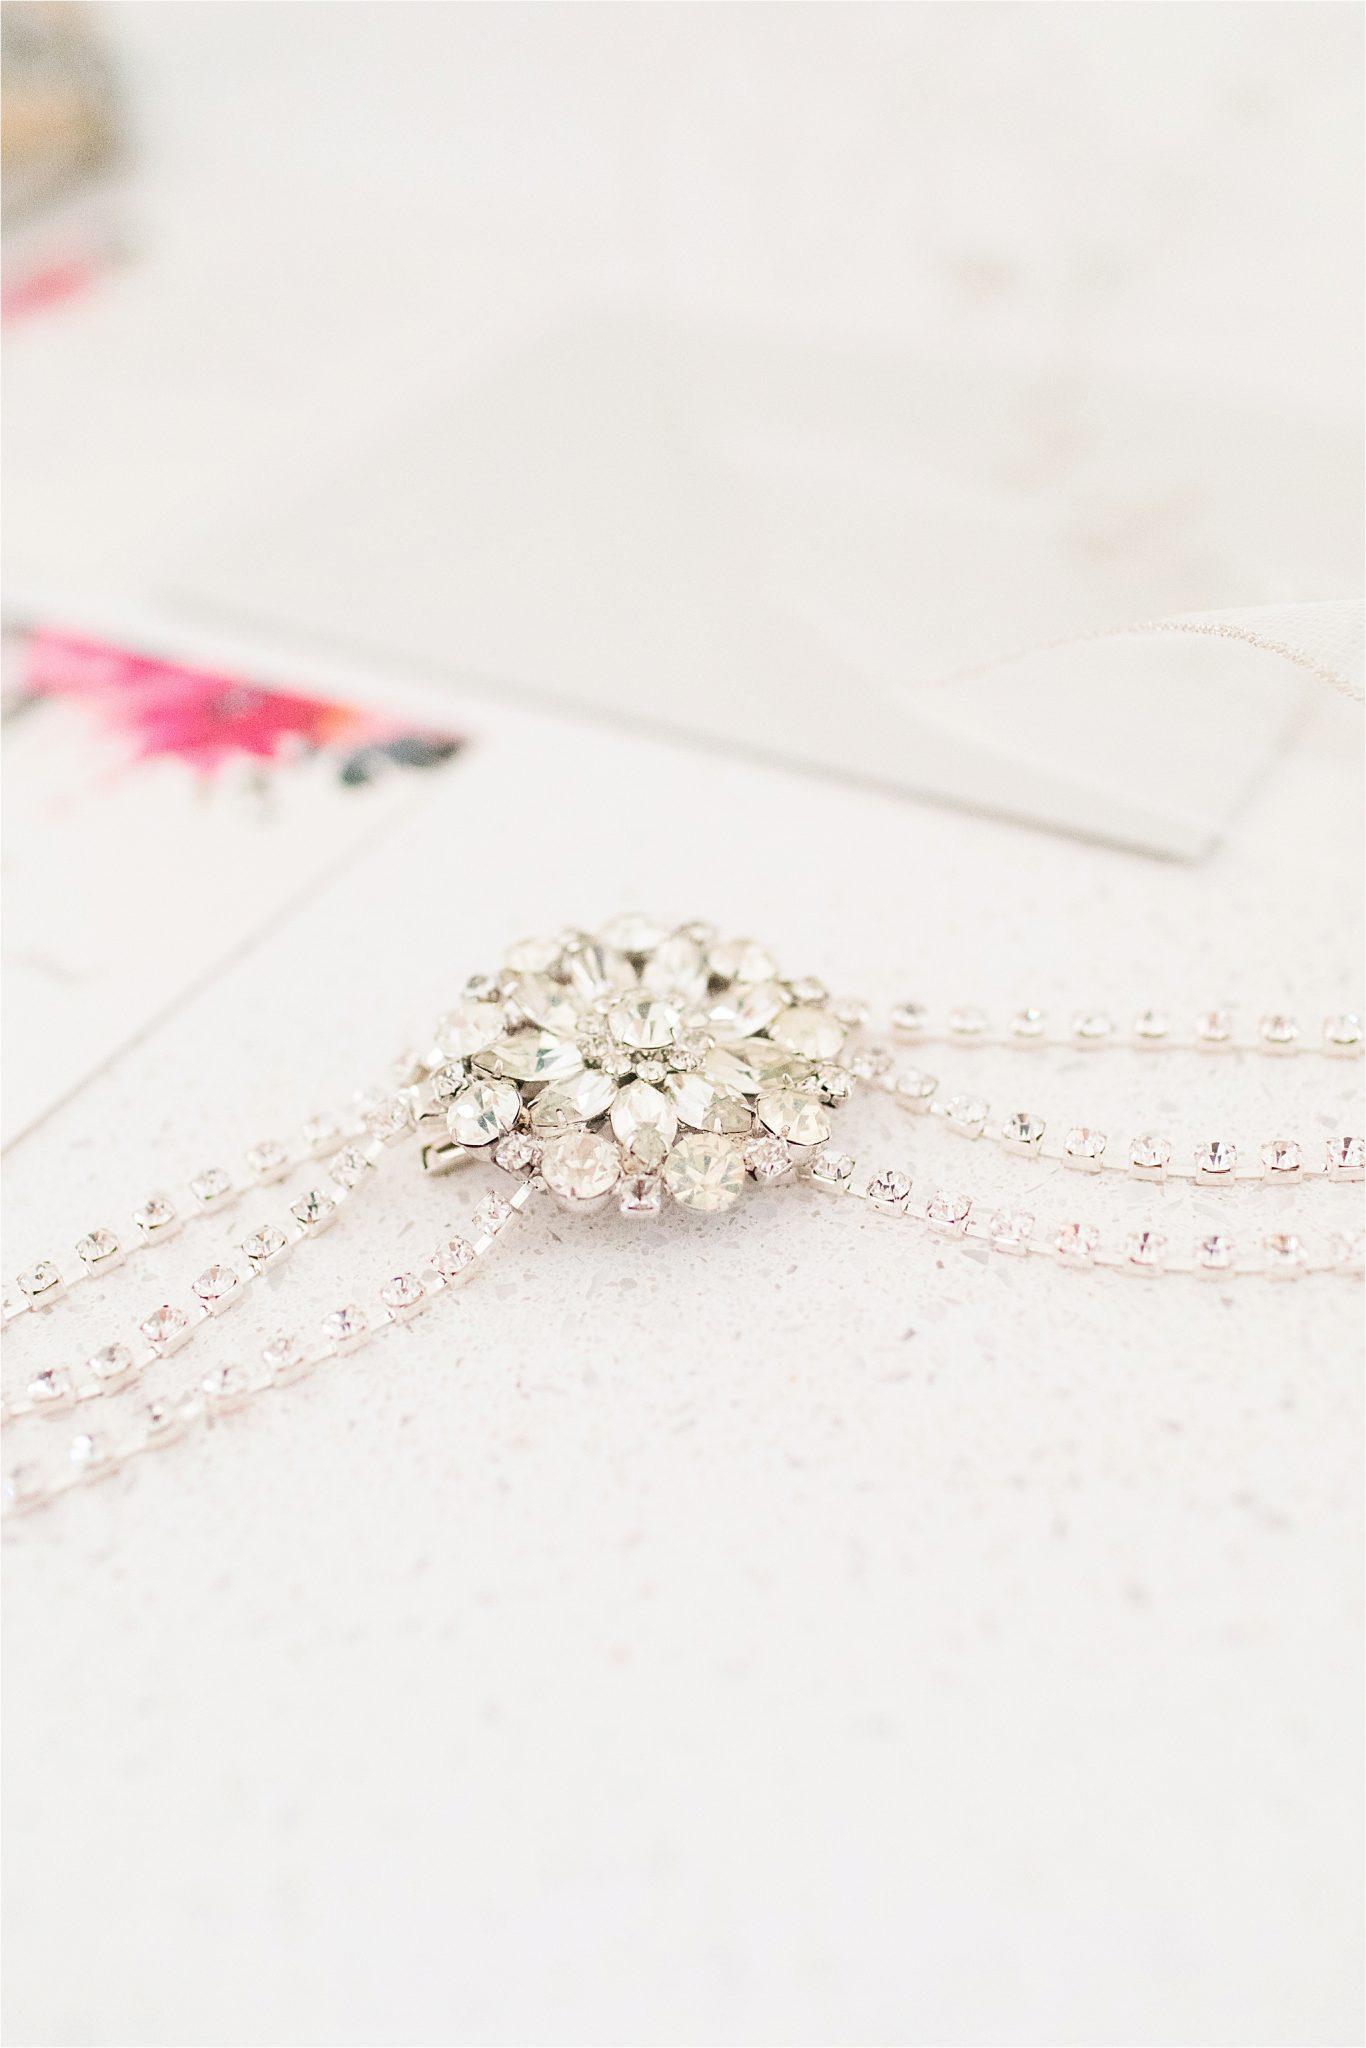 Alabama Wedding Photographer-Little Point Clear Winter Wedding-Meri Beth + Andrew-Wedding Jewelry-Wedding Details